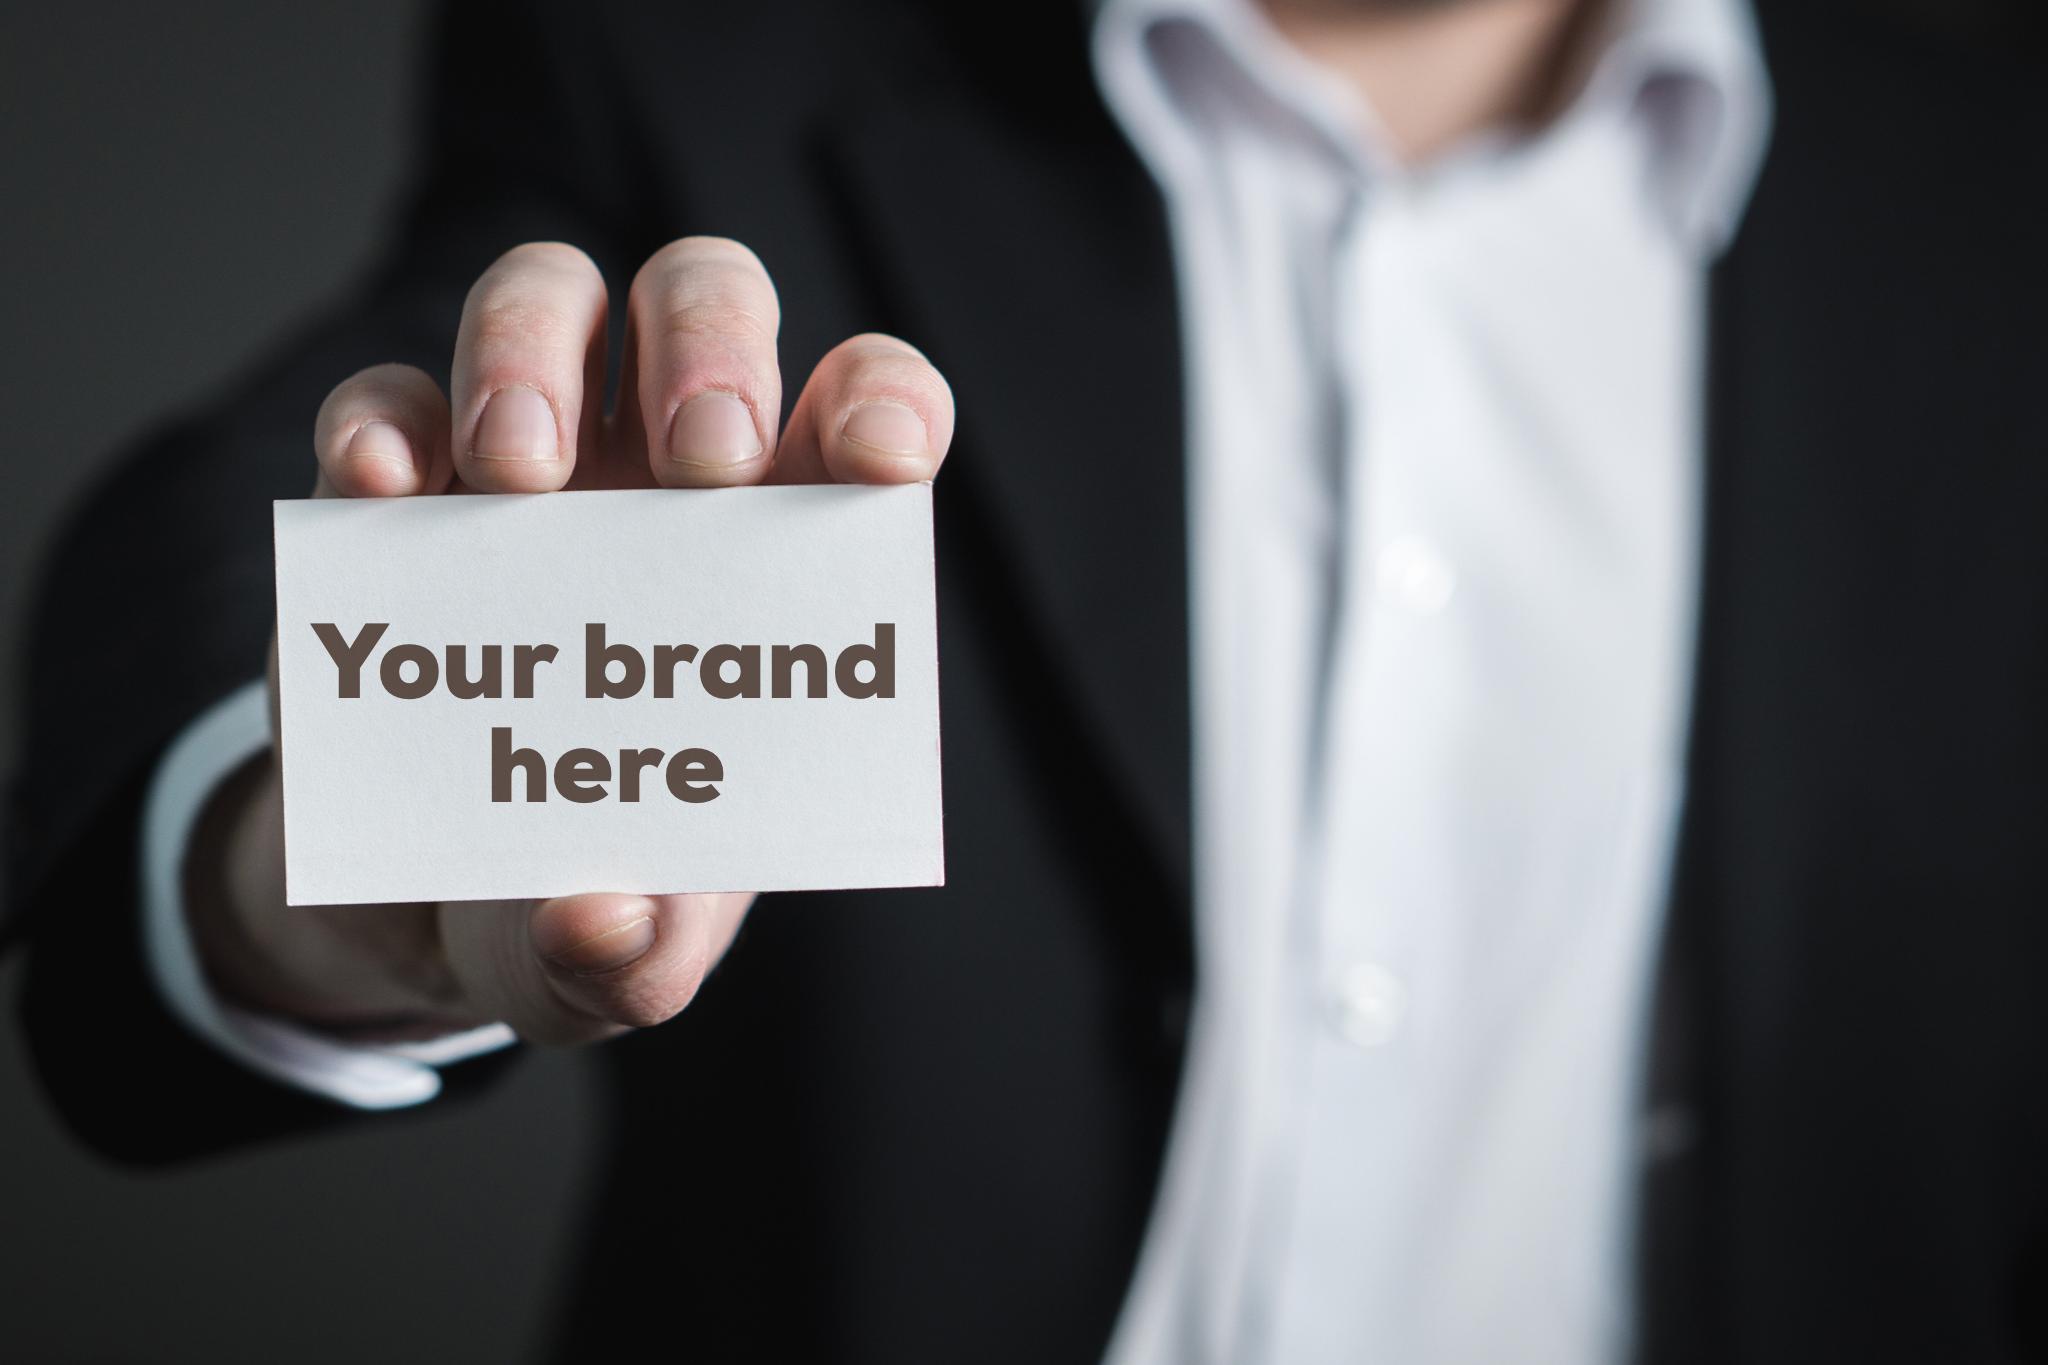 SHD marketing branding and logo design services